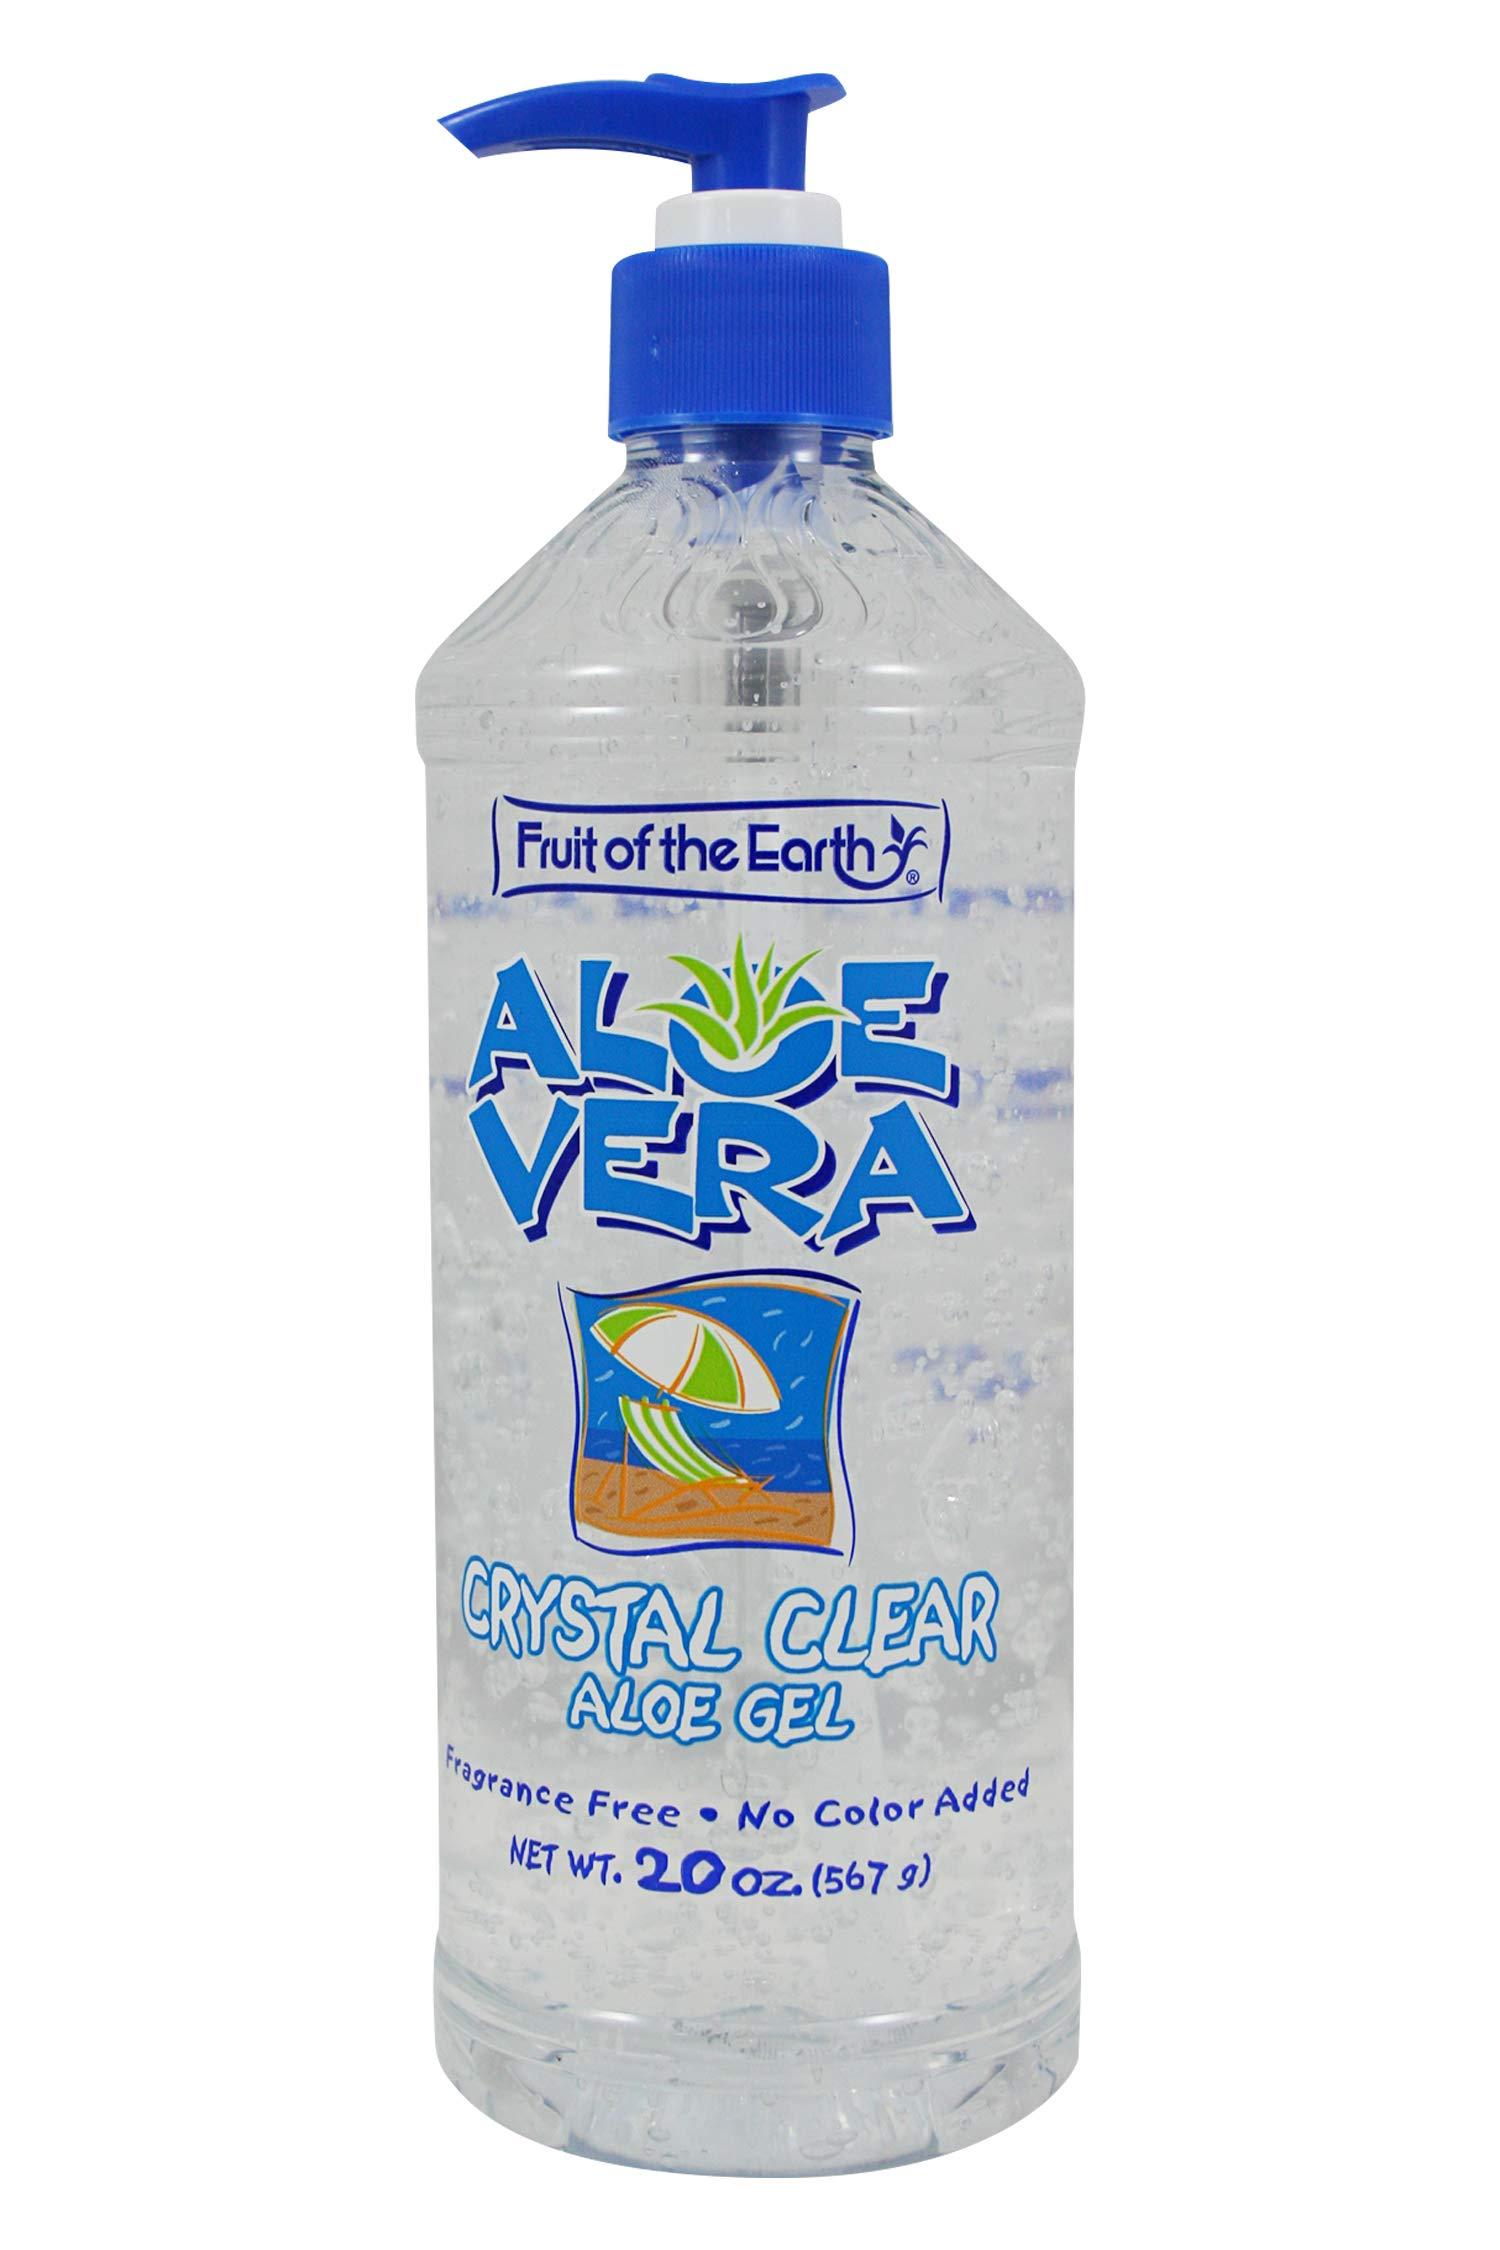 Fruit of the Earth Aloe Vera Crystal Clear Aloe Gel 20 oz (Pack of 6)